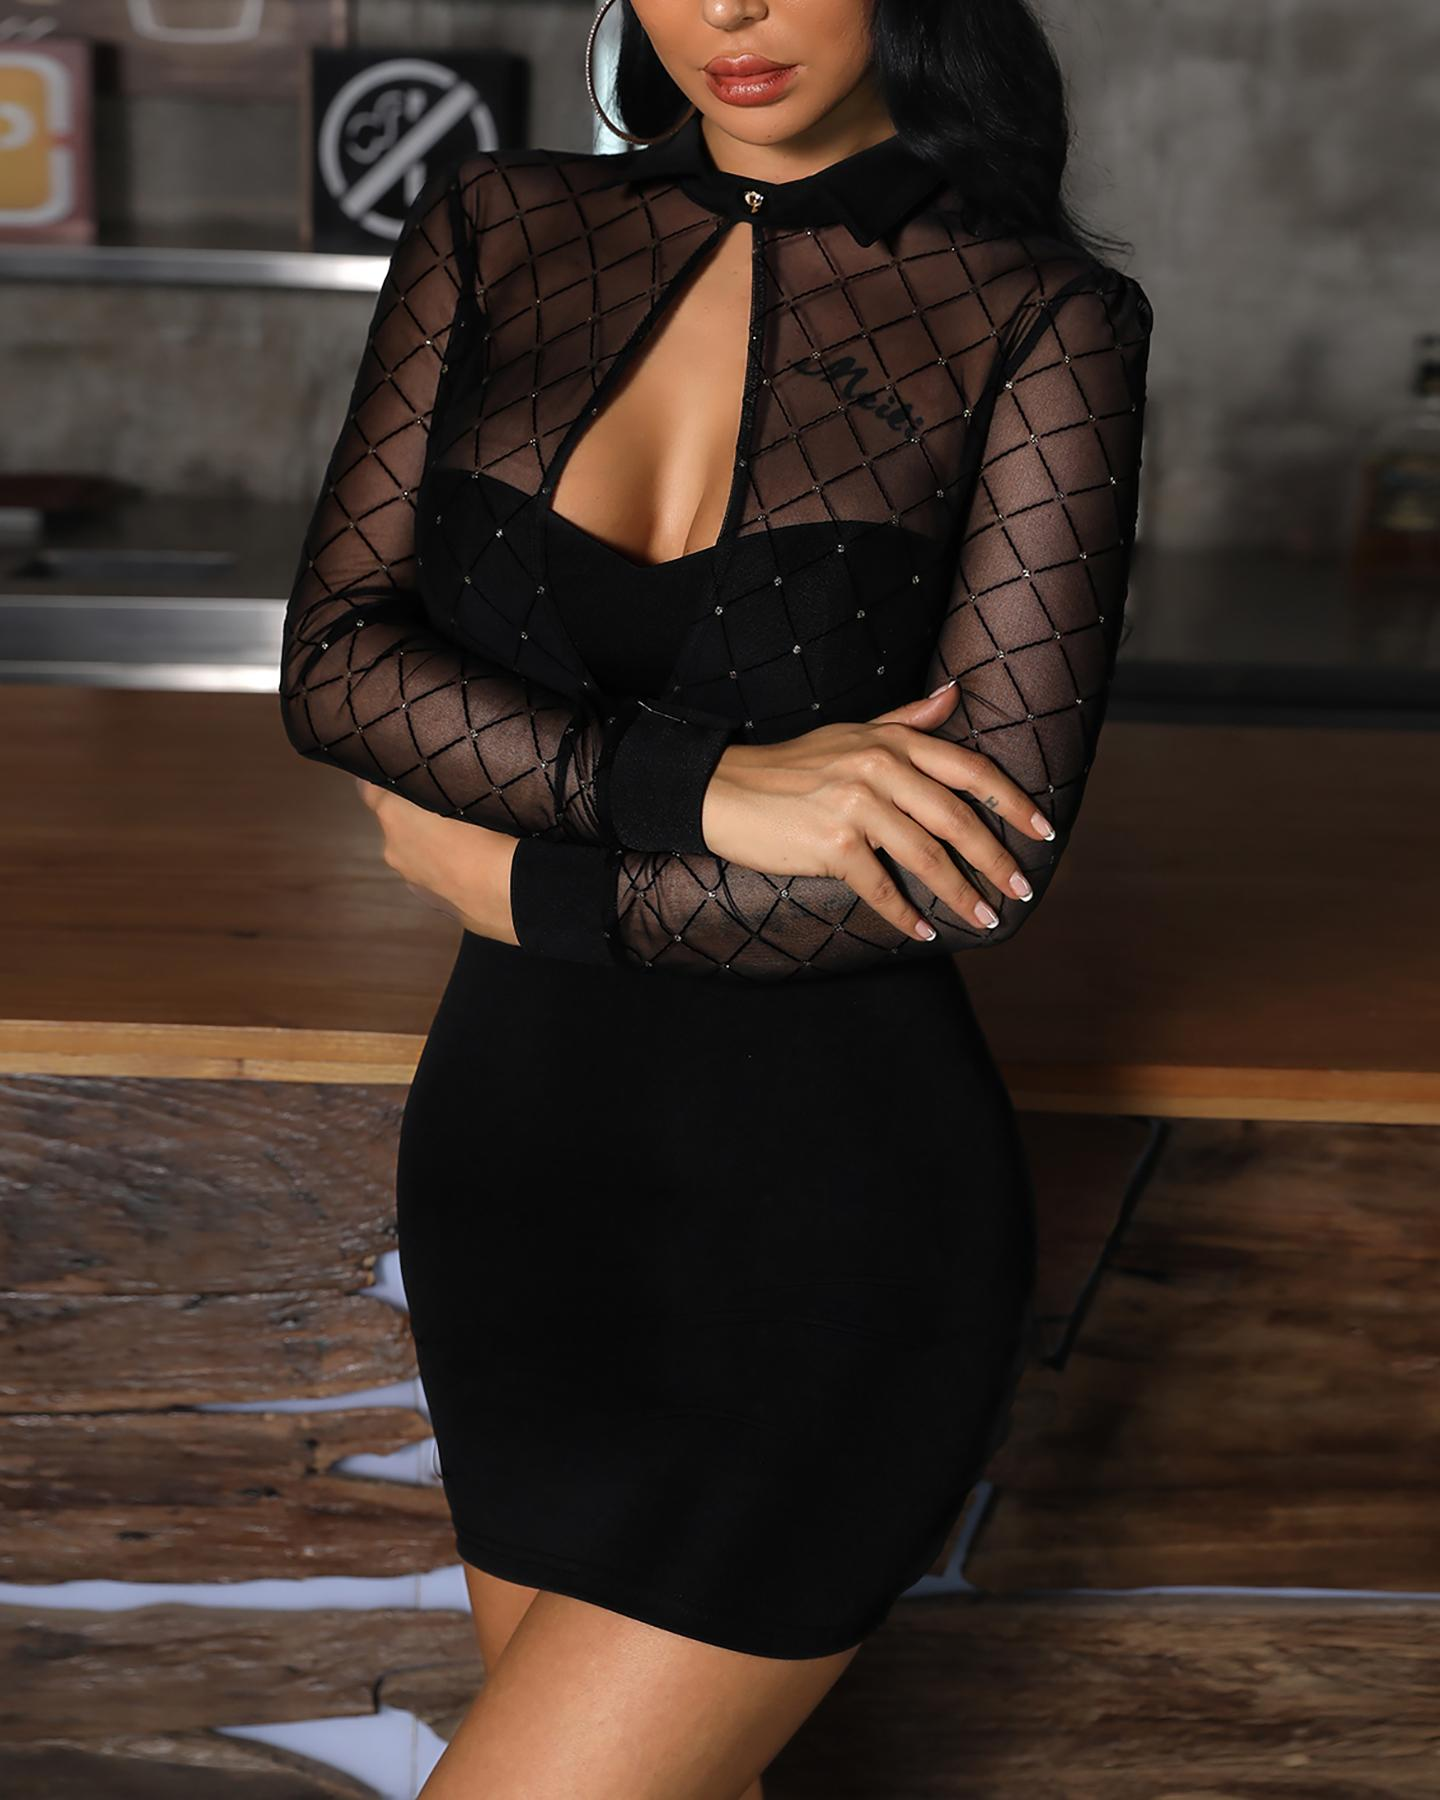 Grid Mesh Insert Cutout Bodycon Dress, Black&gold